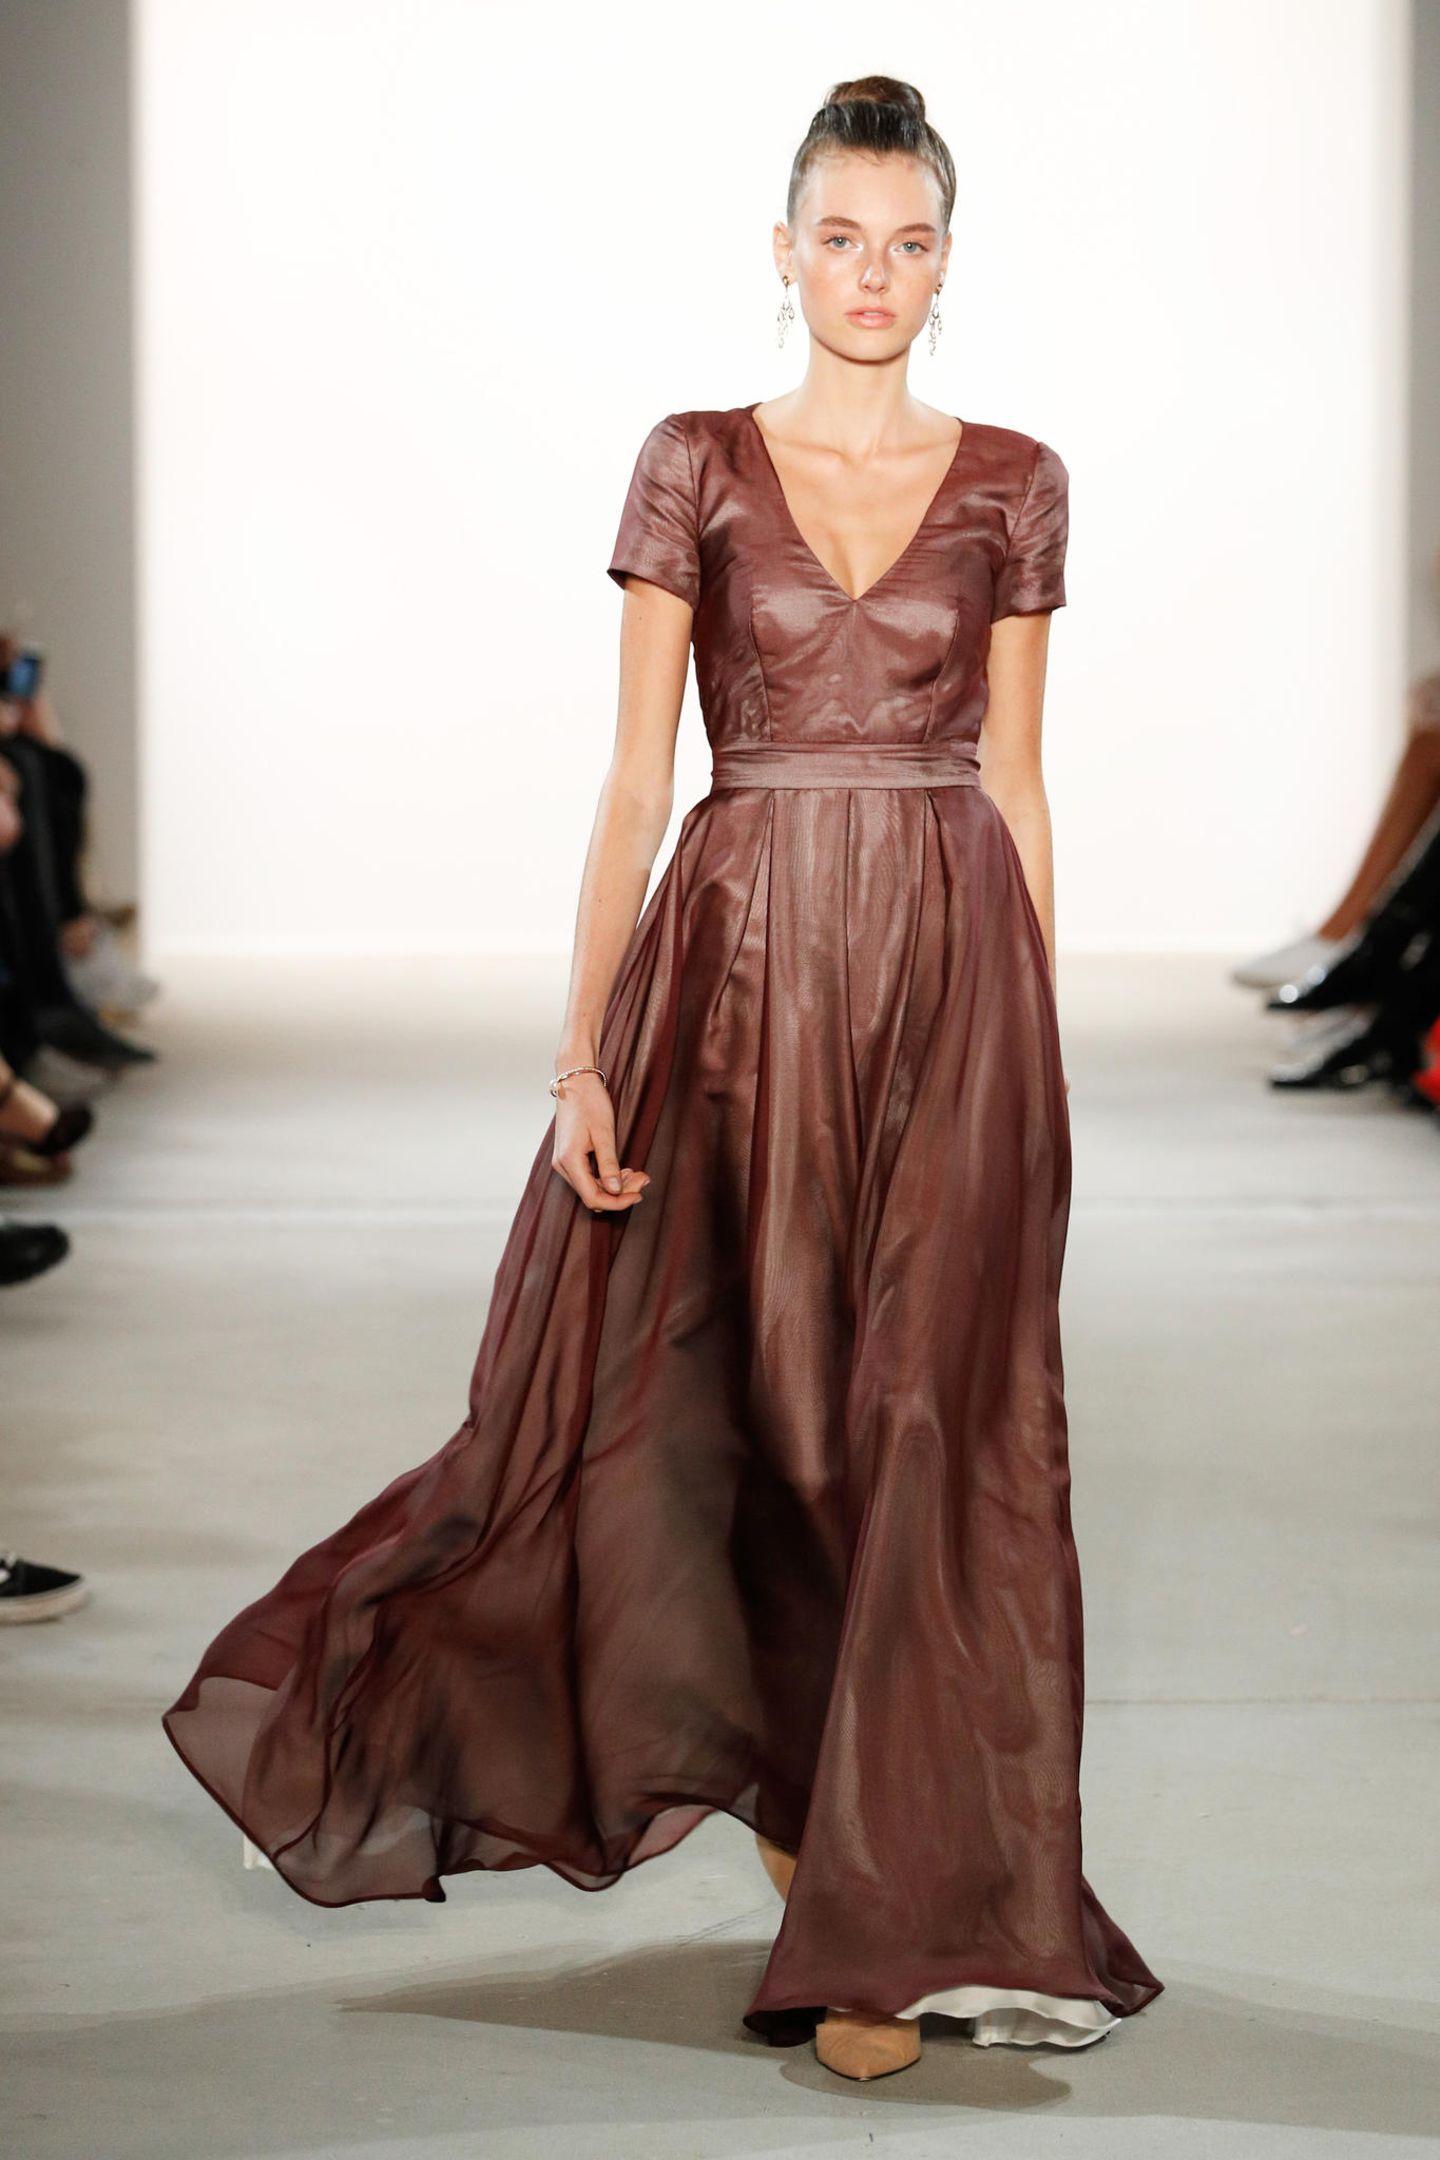 Trendfarbe Braun macht Mode